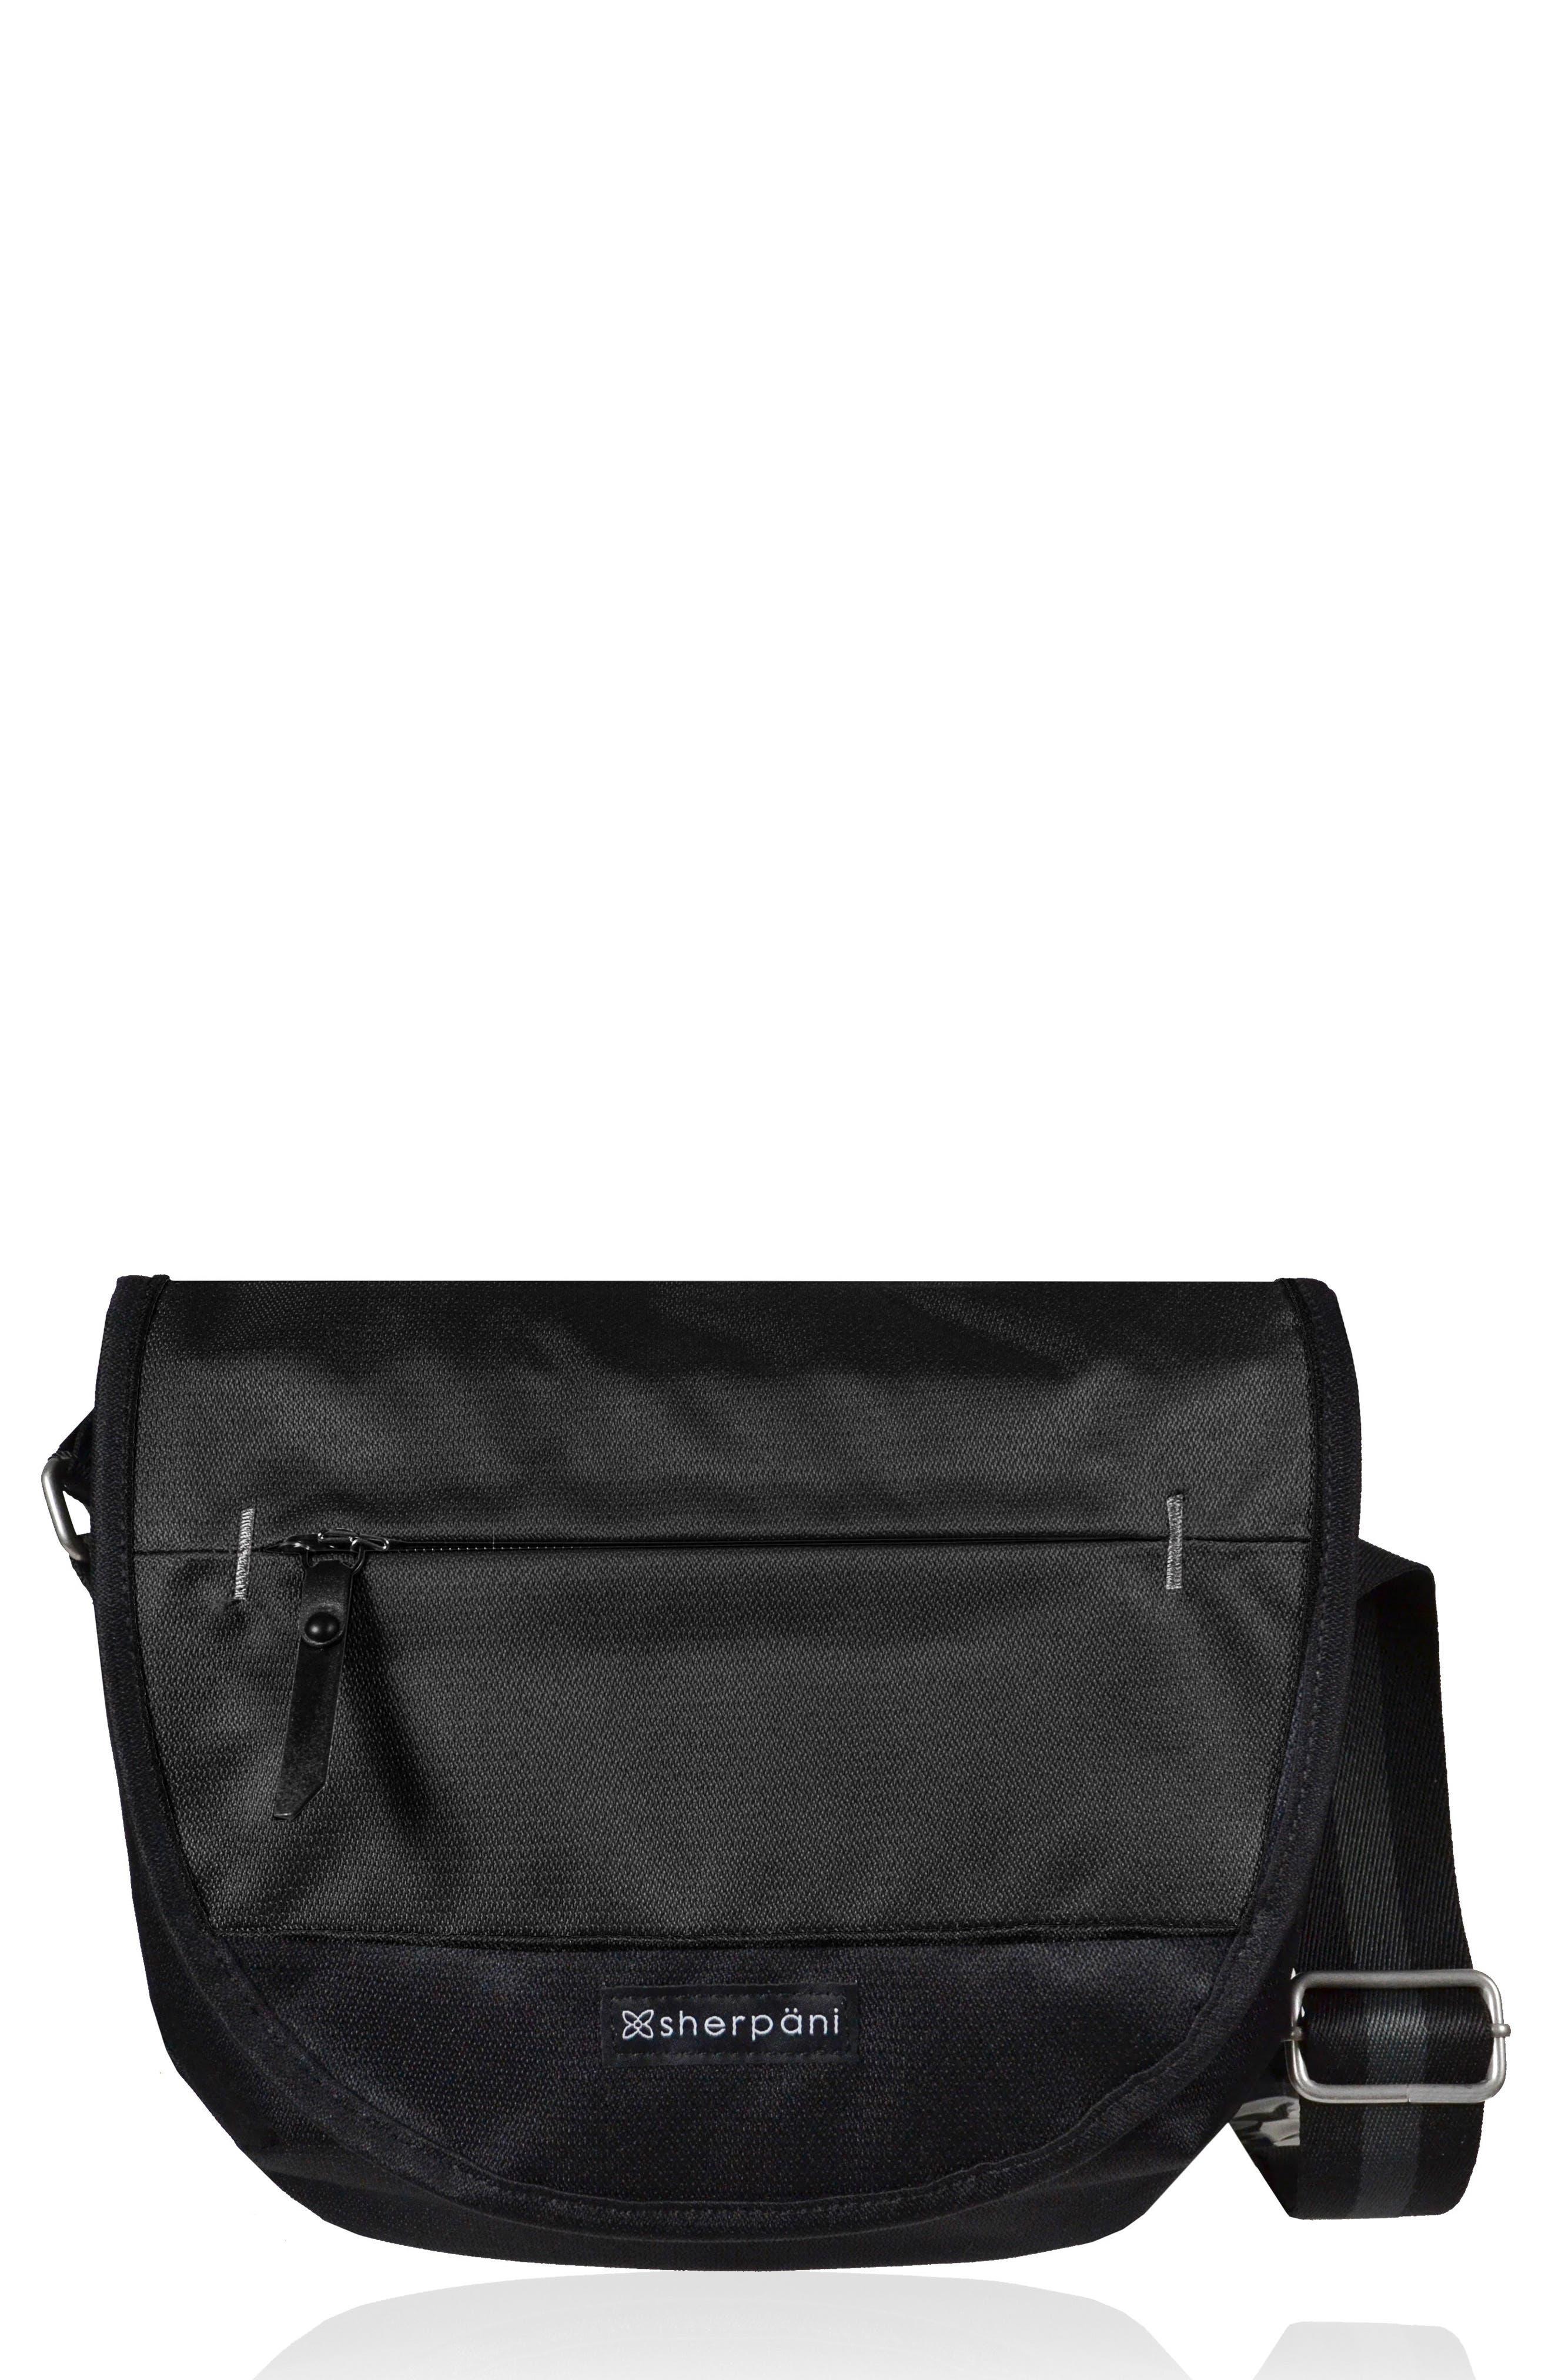 Sherpani Milli Water Resistant RFID Picket Messenger Bag